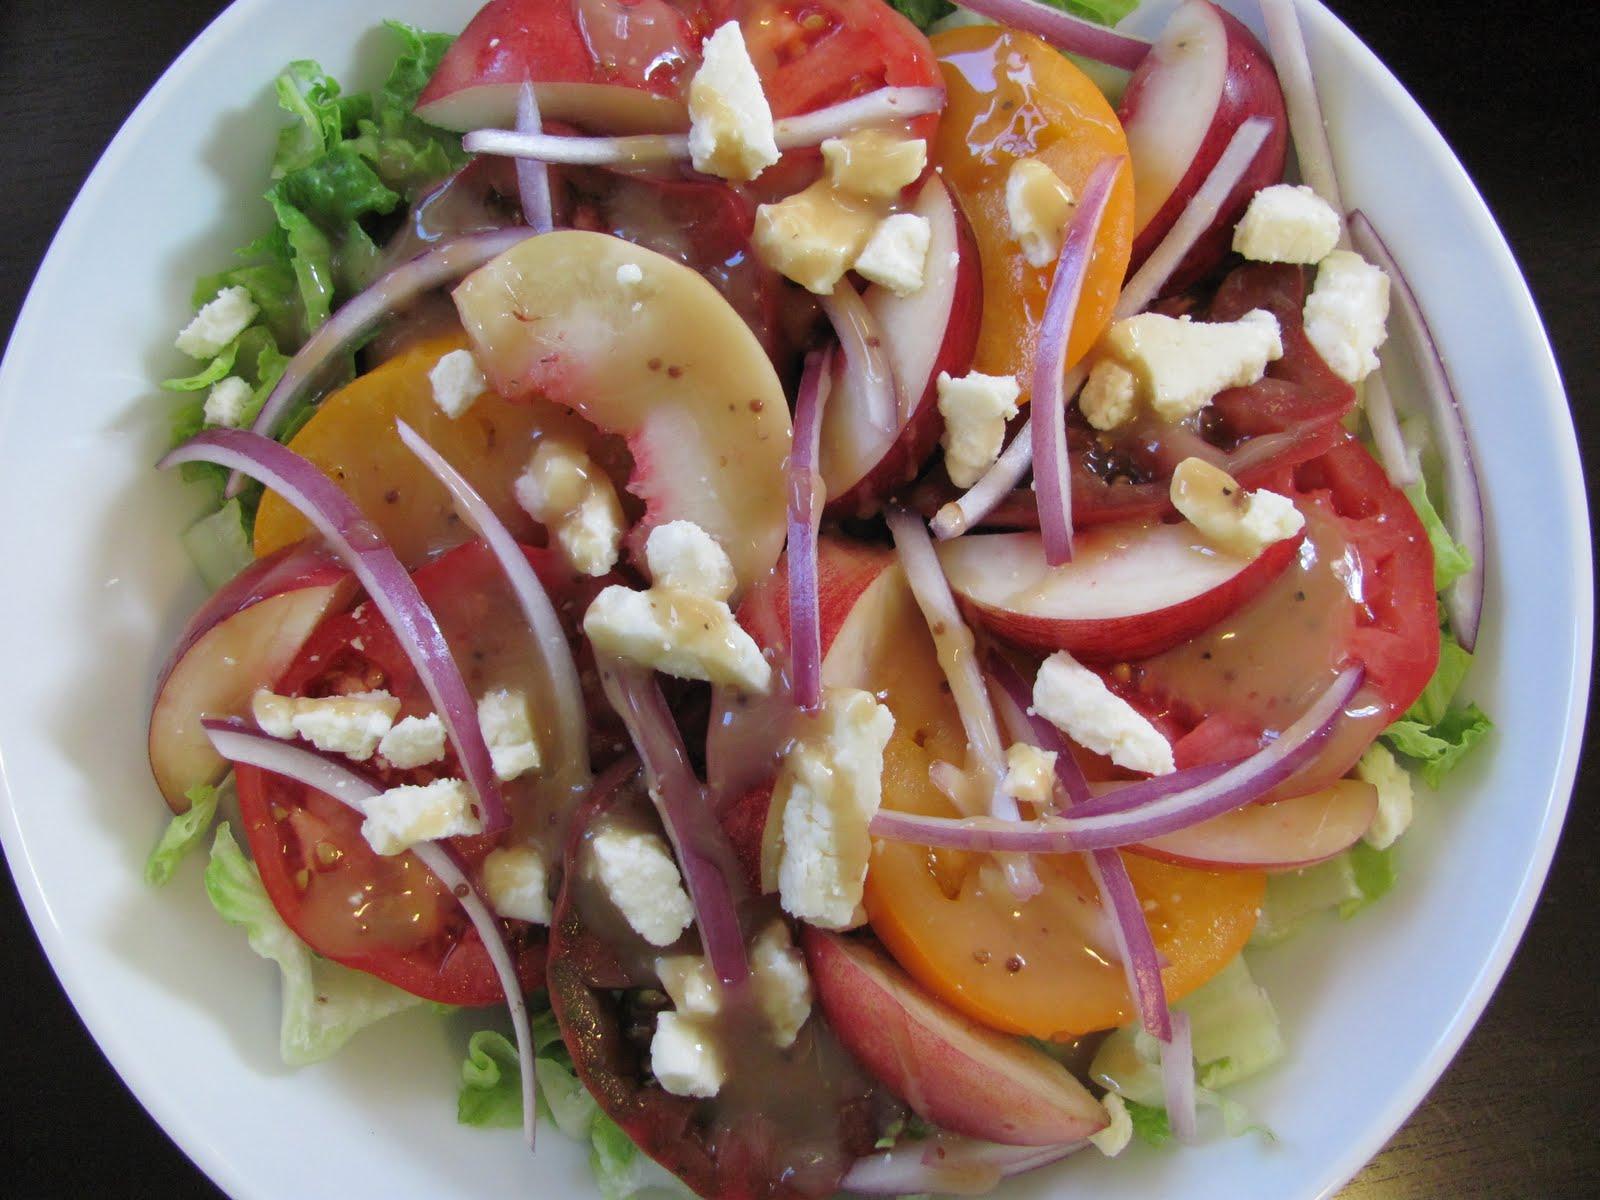 Veggie by Season: Nectarine and Heirloom Tomato Salad